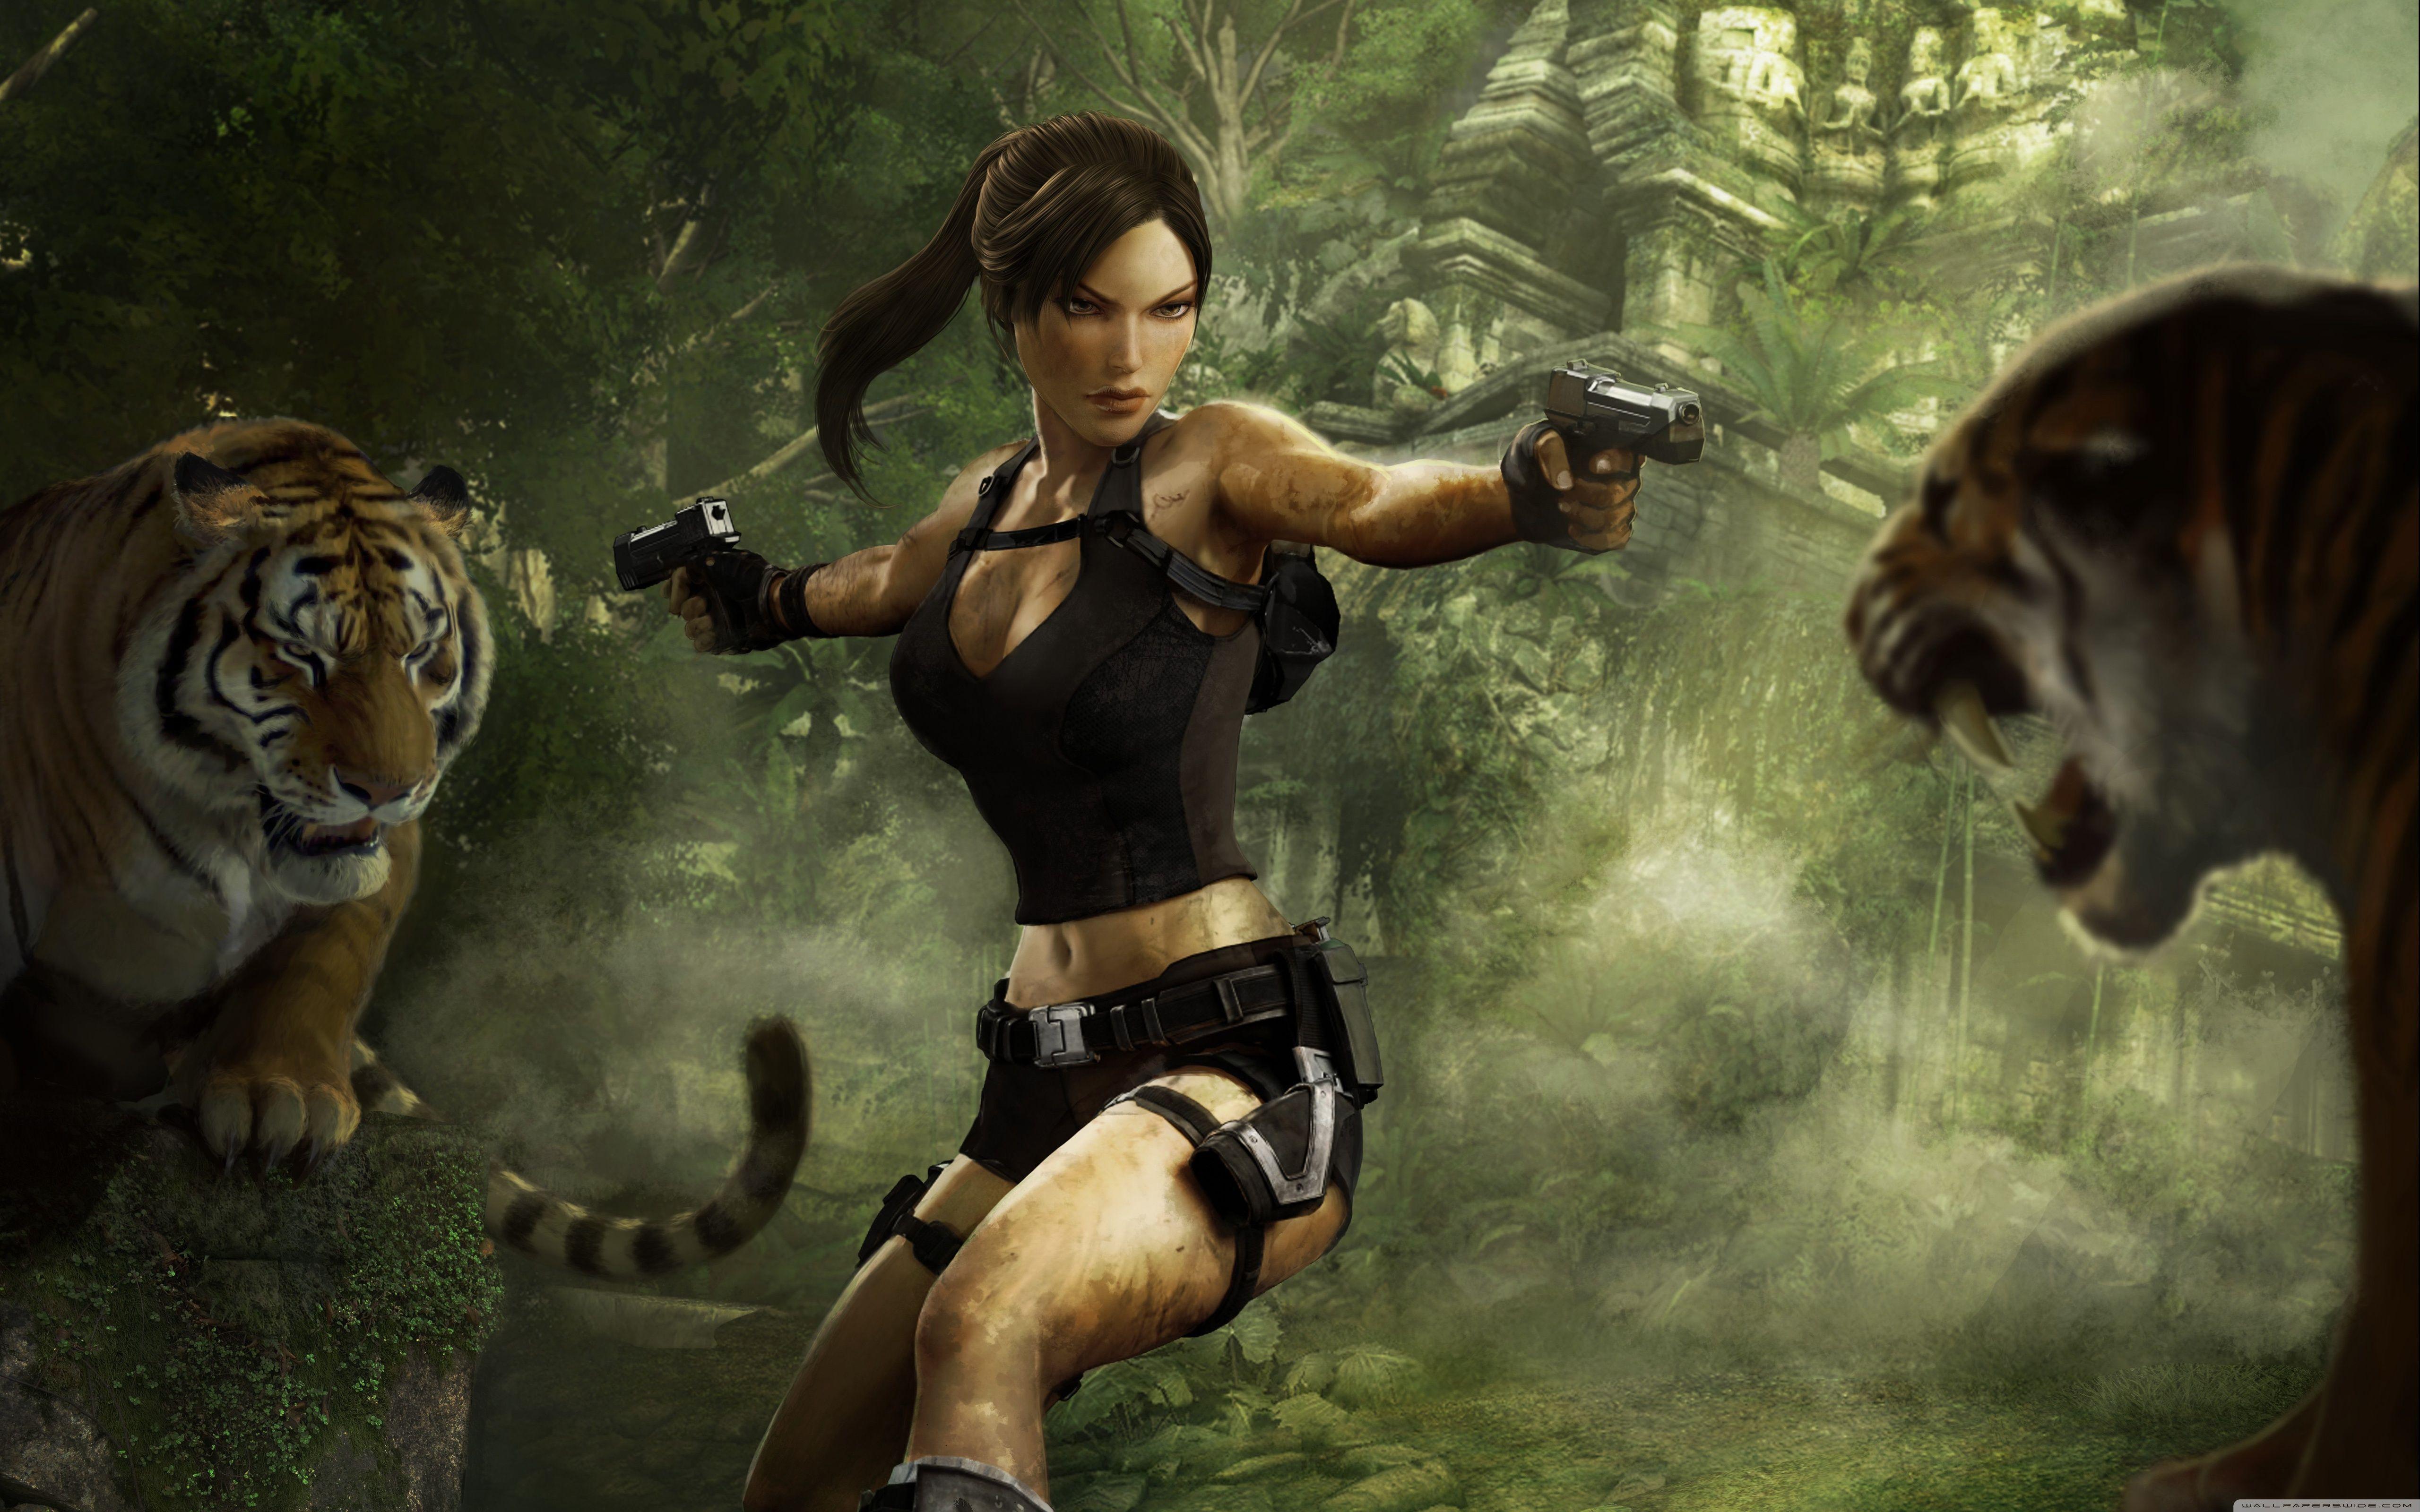 Tomb Raider Underworld Wallpapers Top Free Tomb Raider